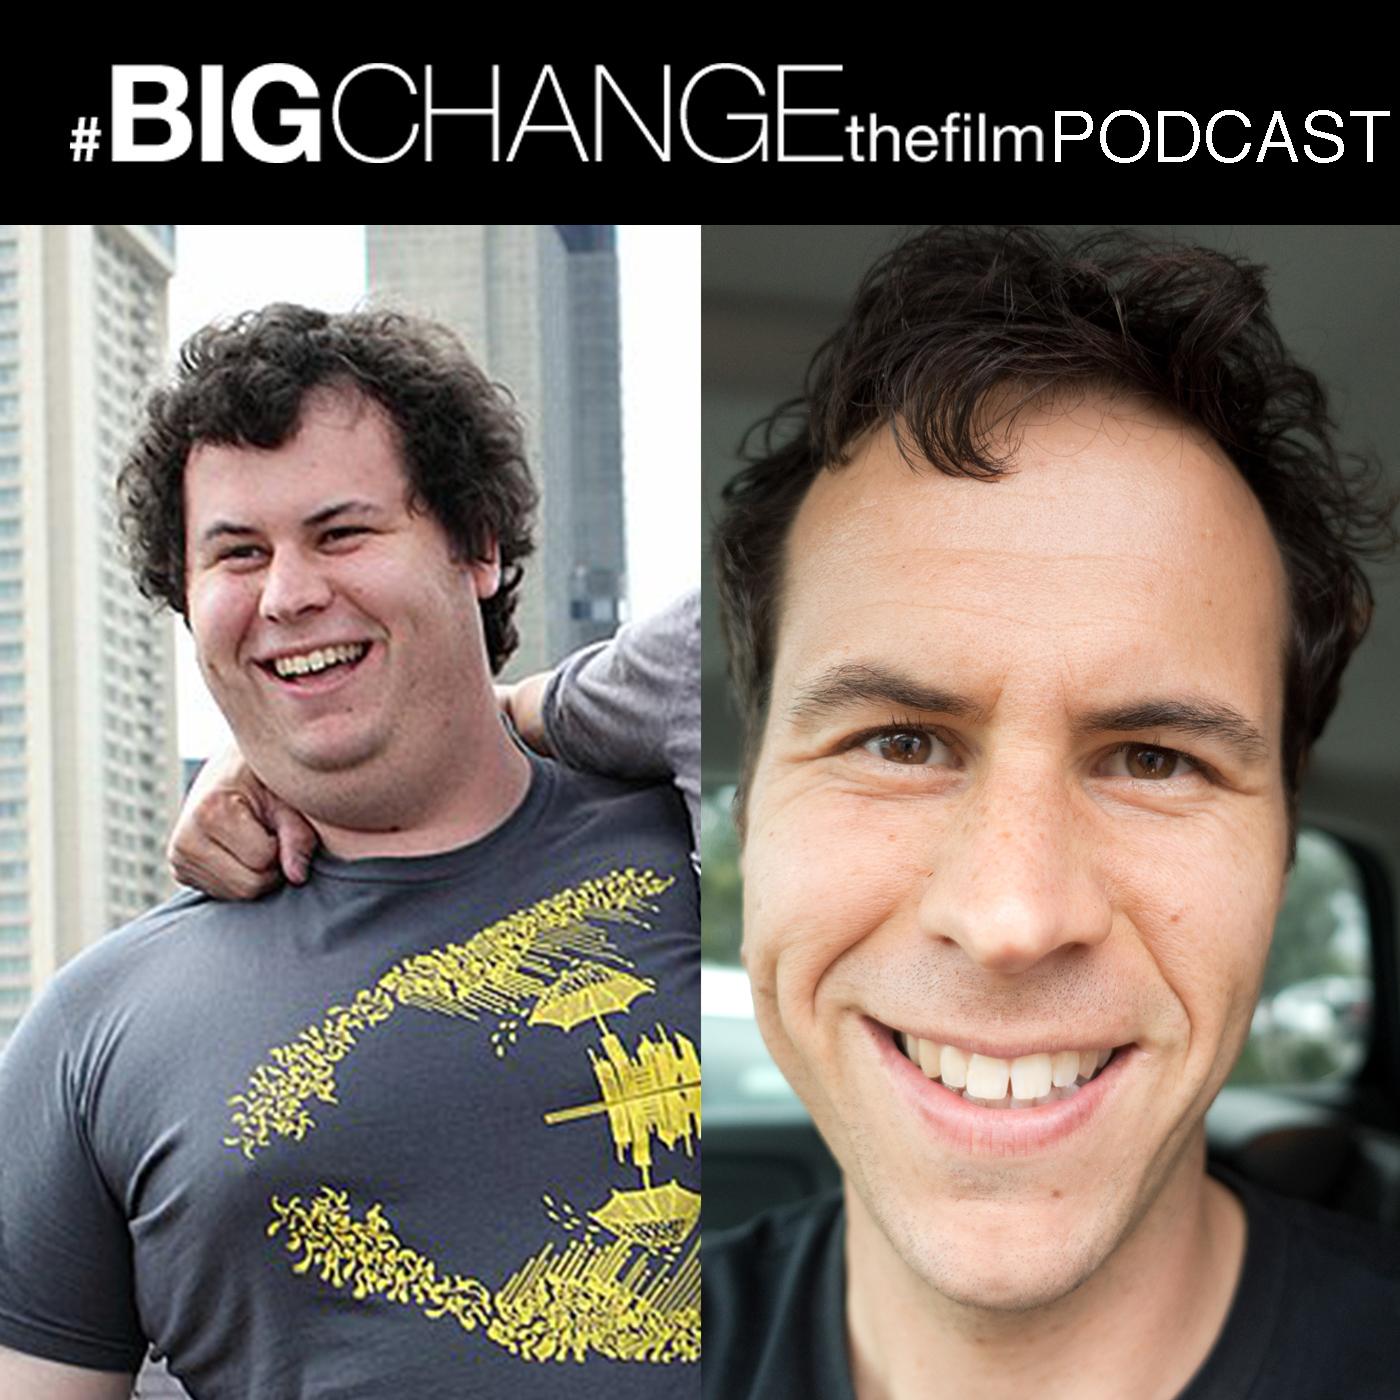 Big Change The Film Podcast show art